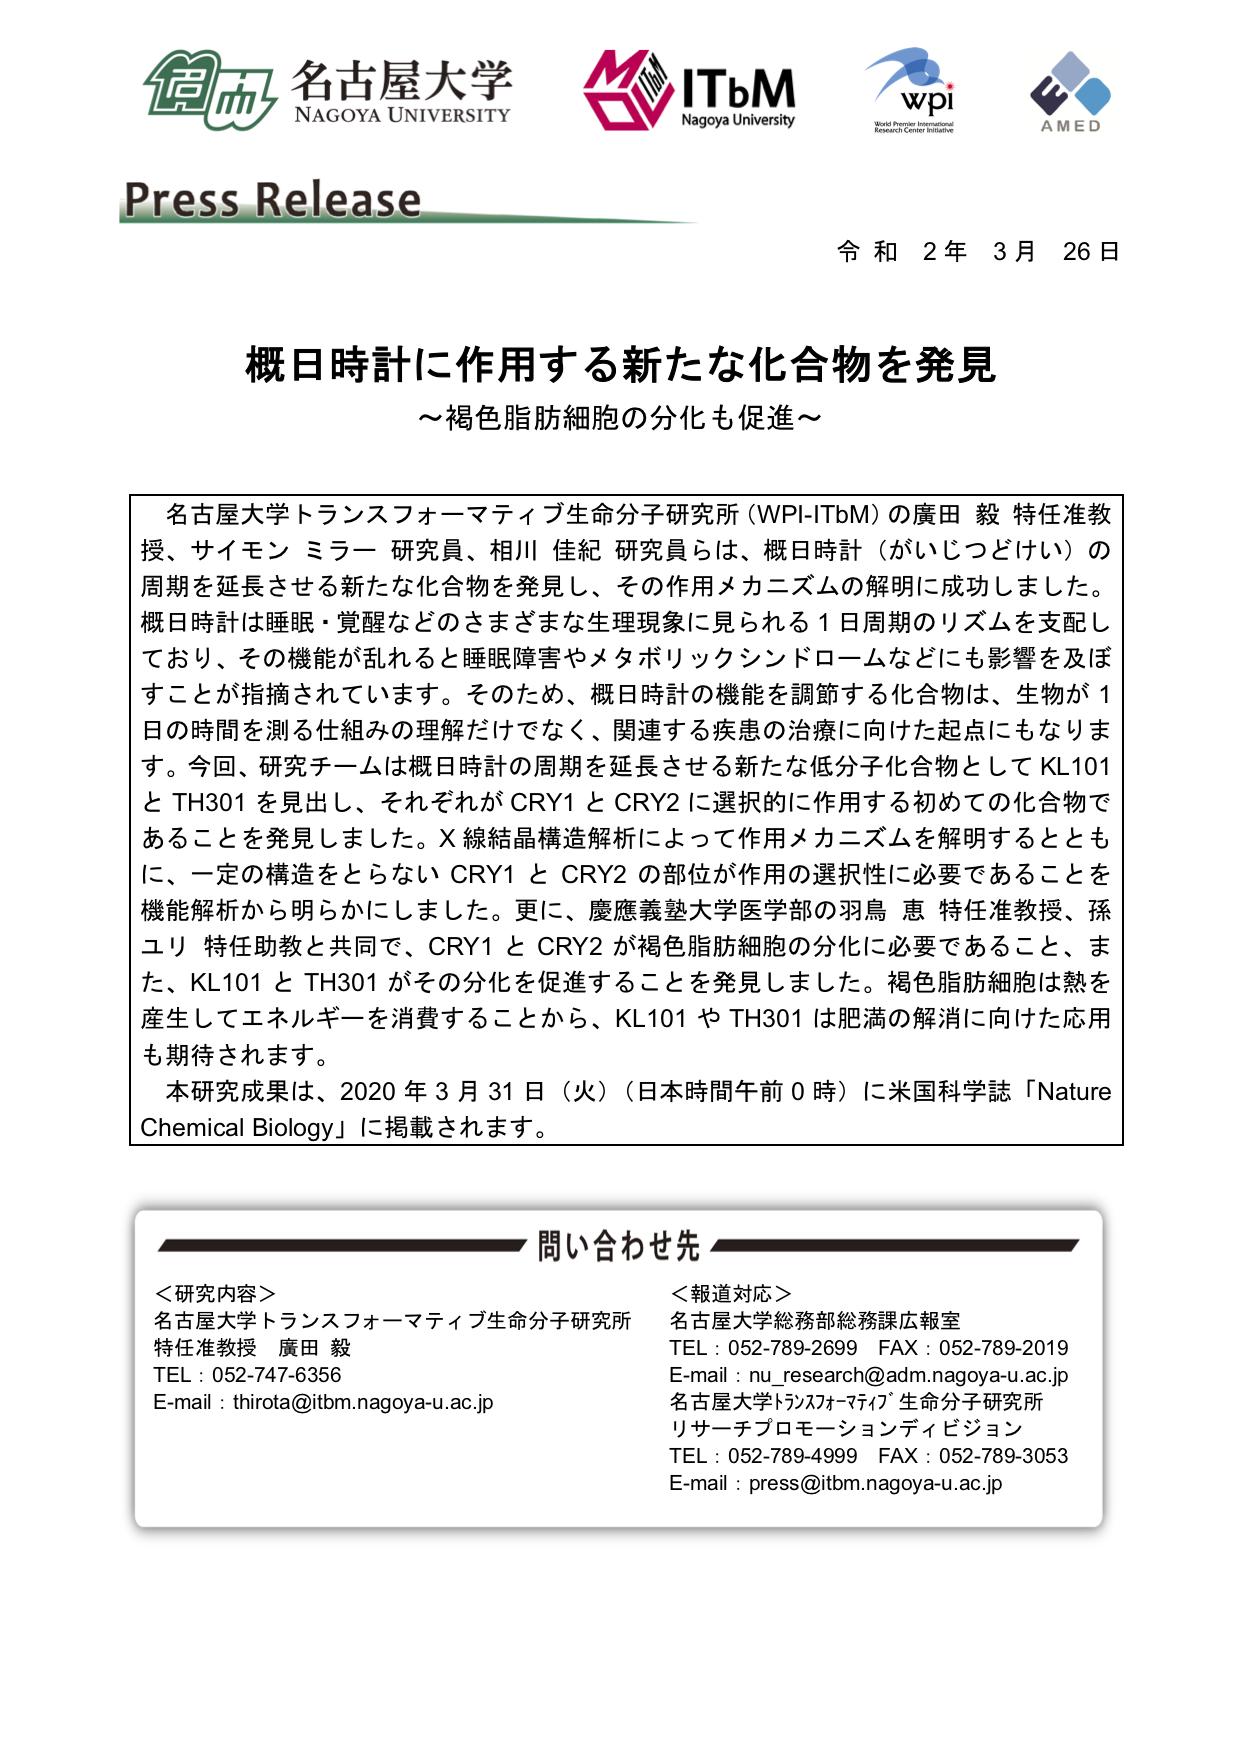 http://www.itbm.nagoya-u.ac.jp/ja/research/20200331_Hirota.png